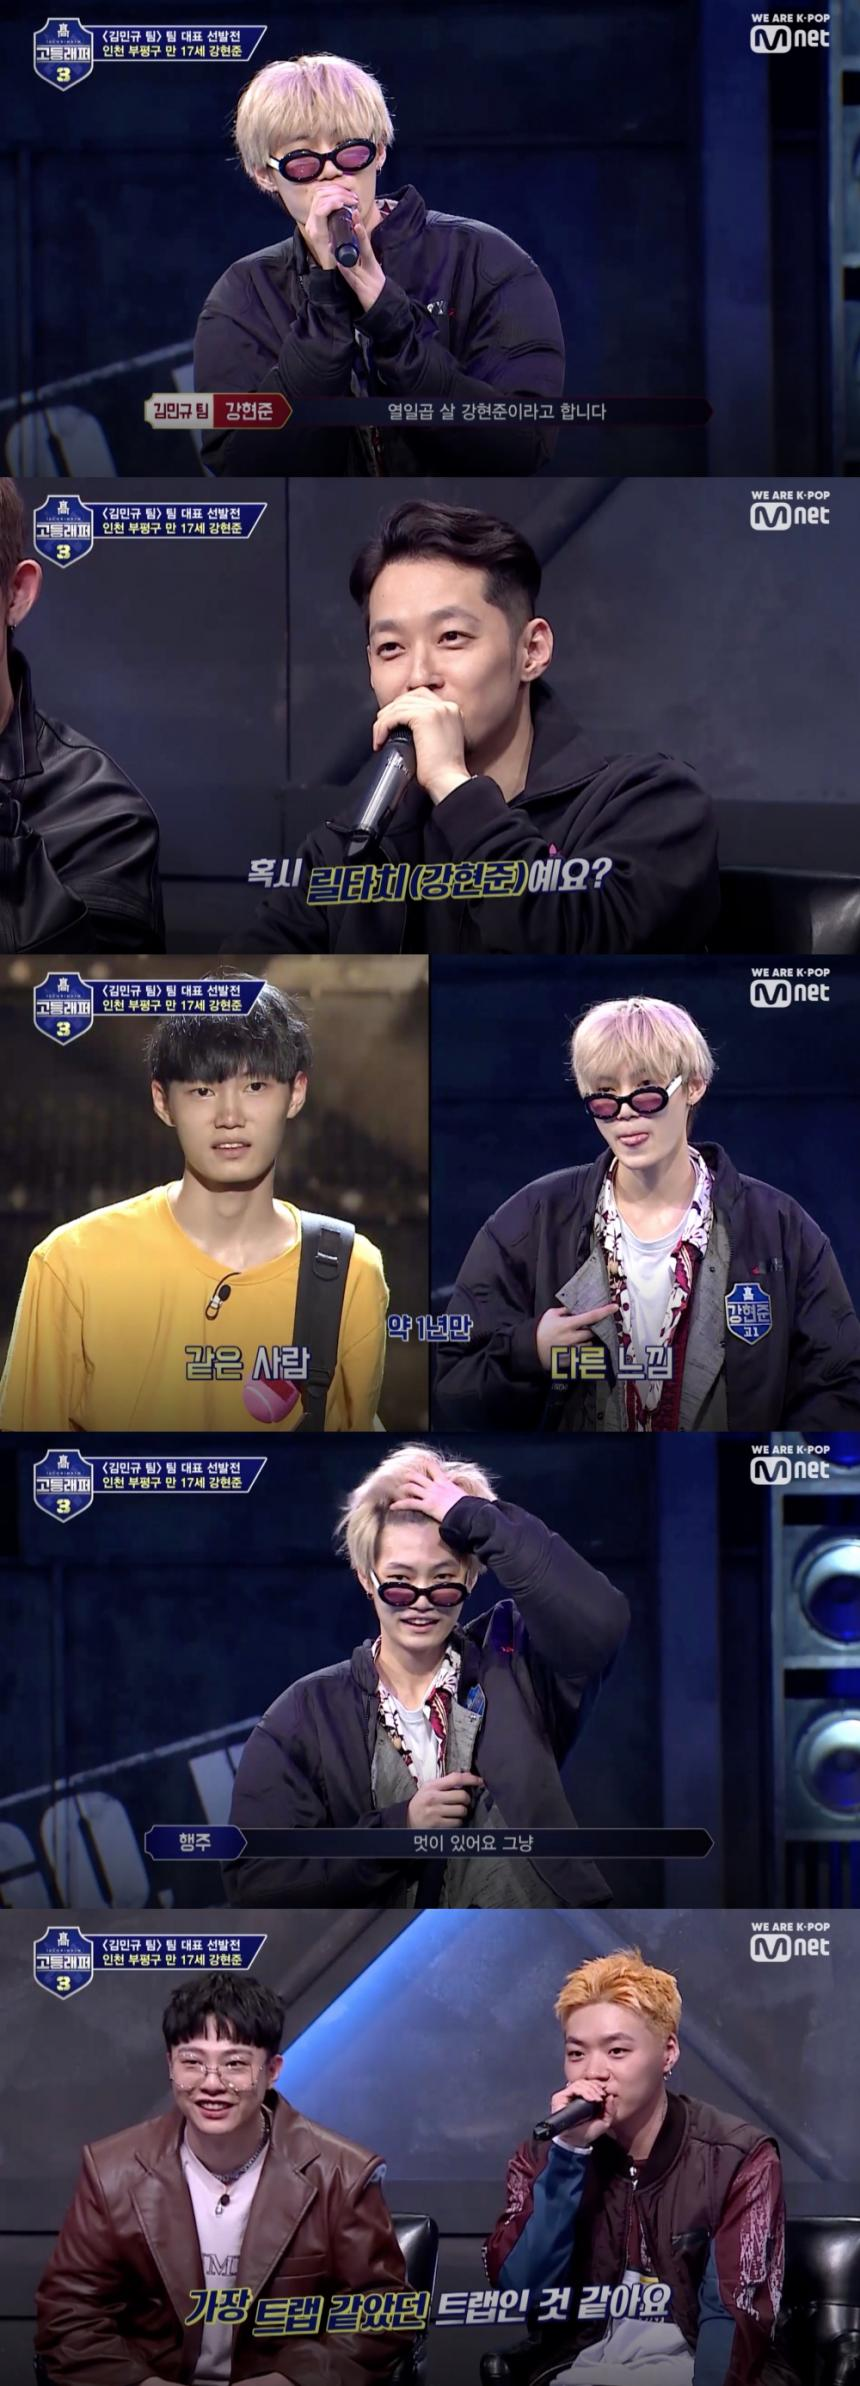 Mnet '고등래퍼3' 방송 캡처